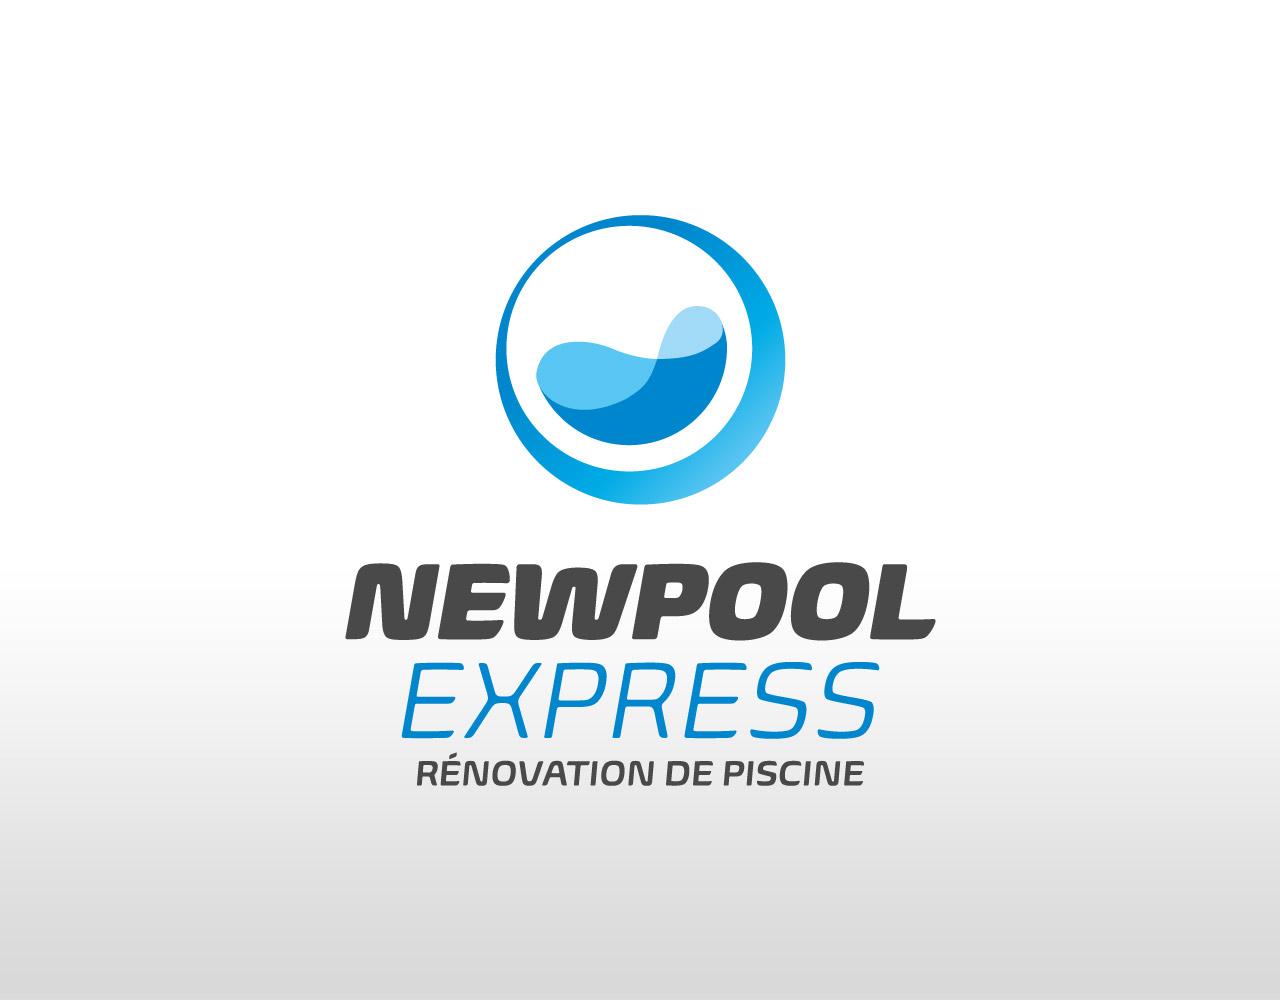 newpoolexpress-creation-logo-charte-graphique-identite-visuelle-caconcept-alexis-cretin